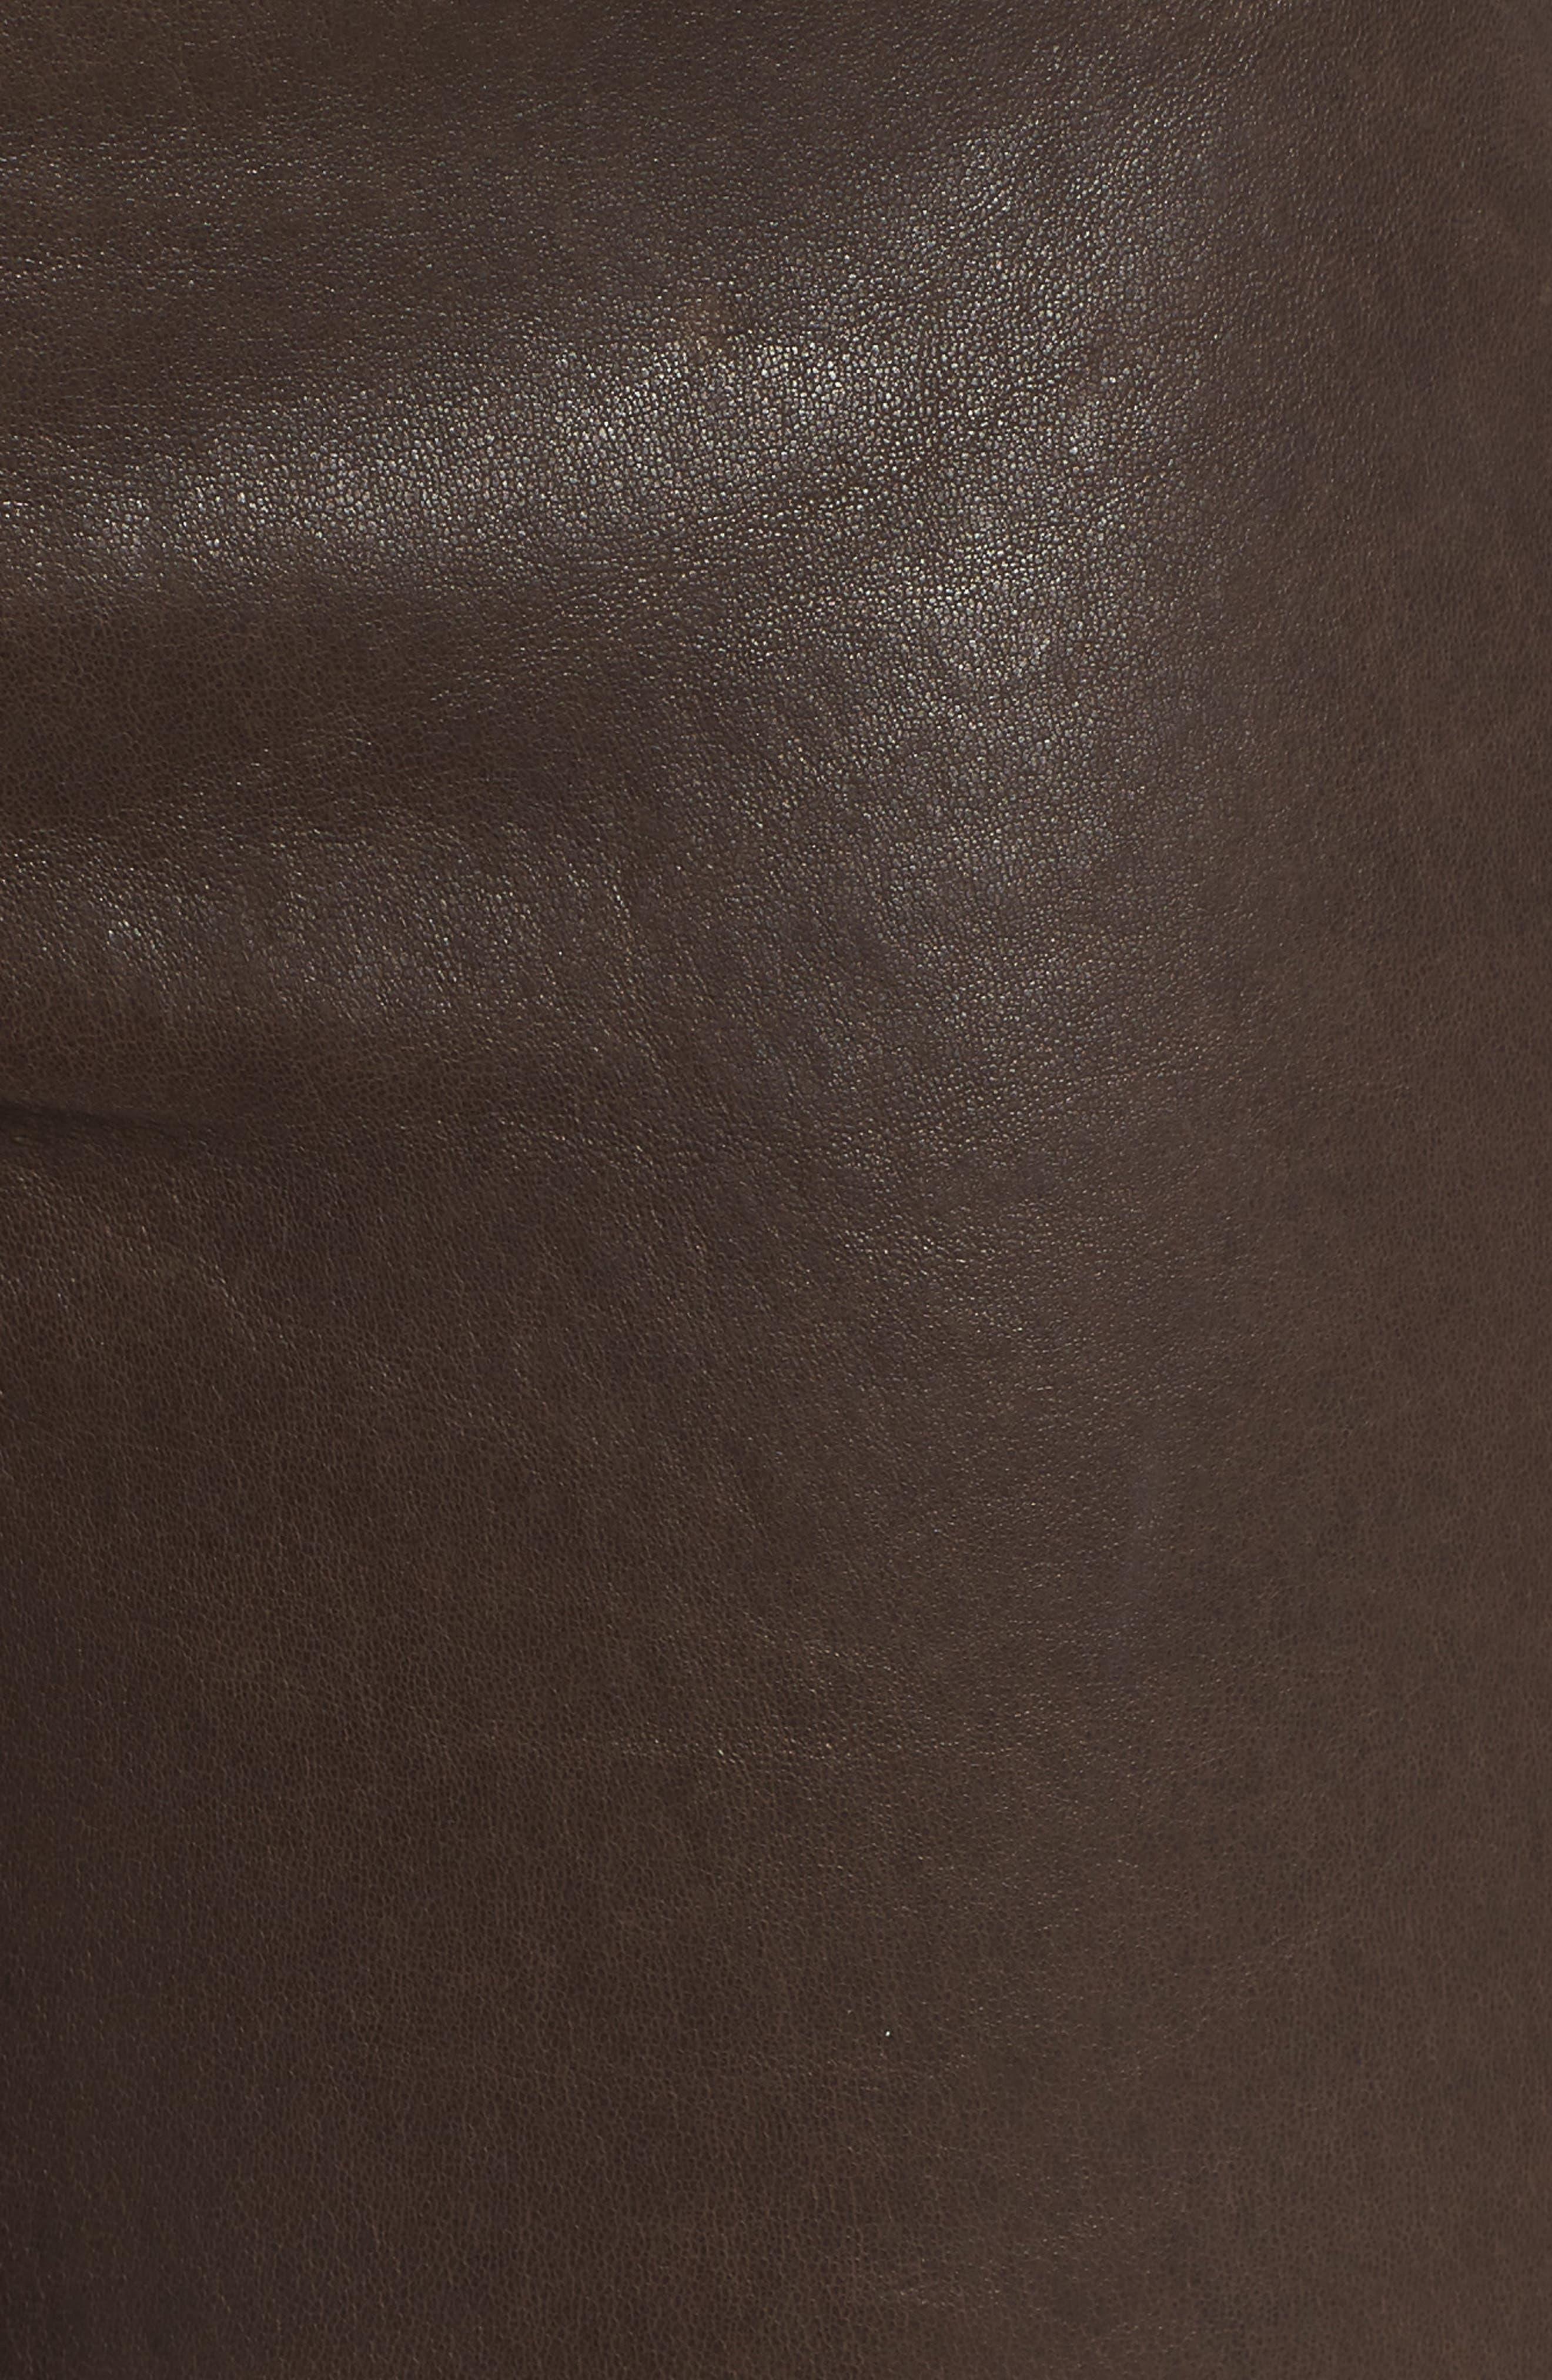 '8001' Lambskin Leather Pants,                             Alternate thumbnail 76, color,